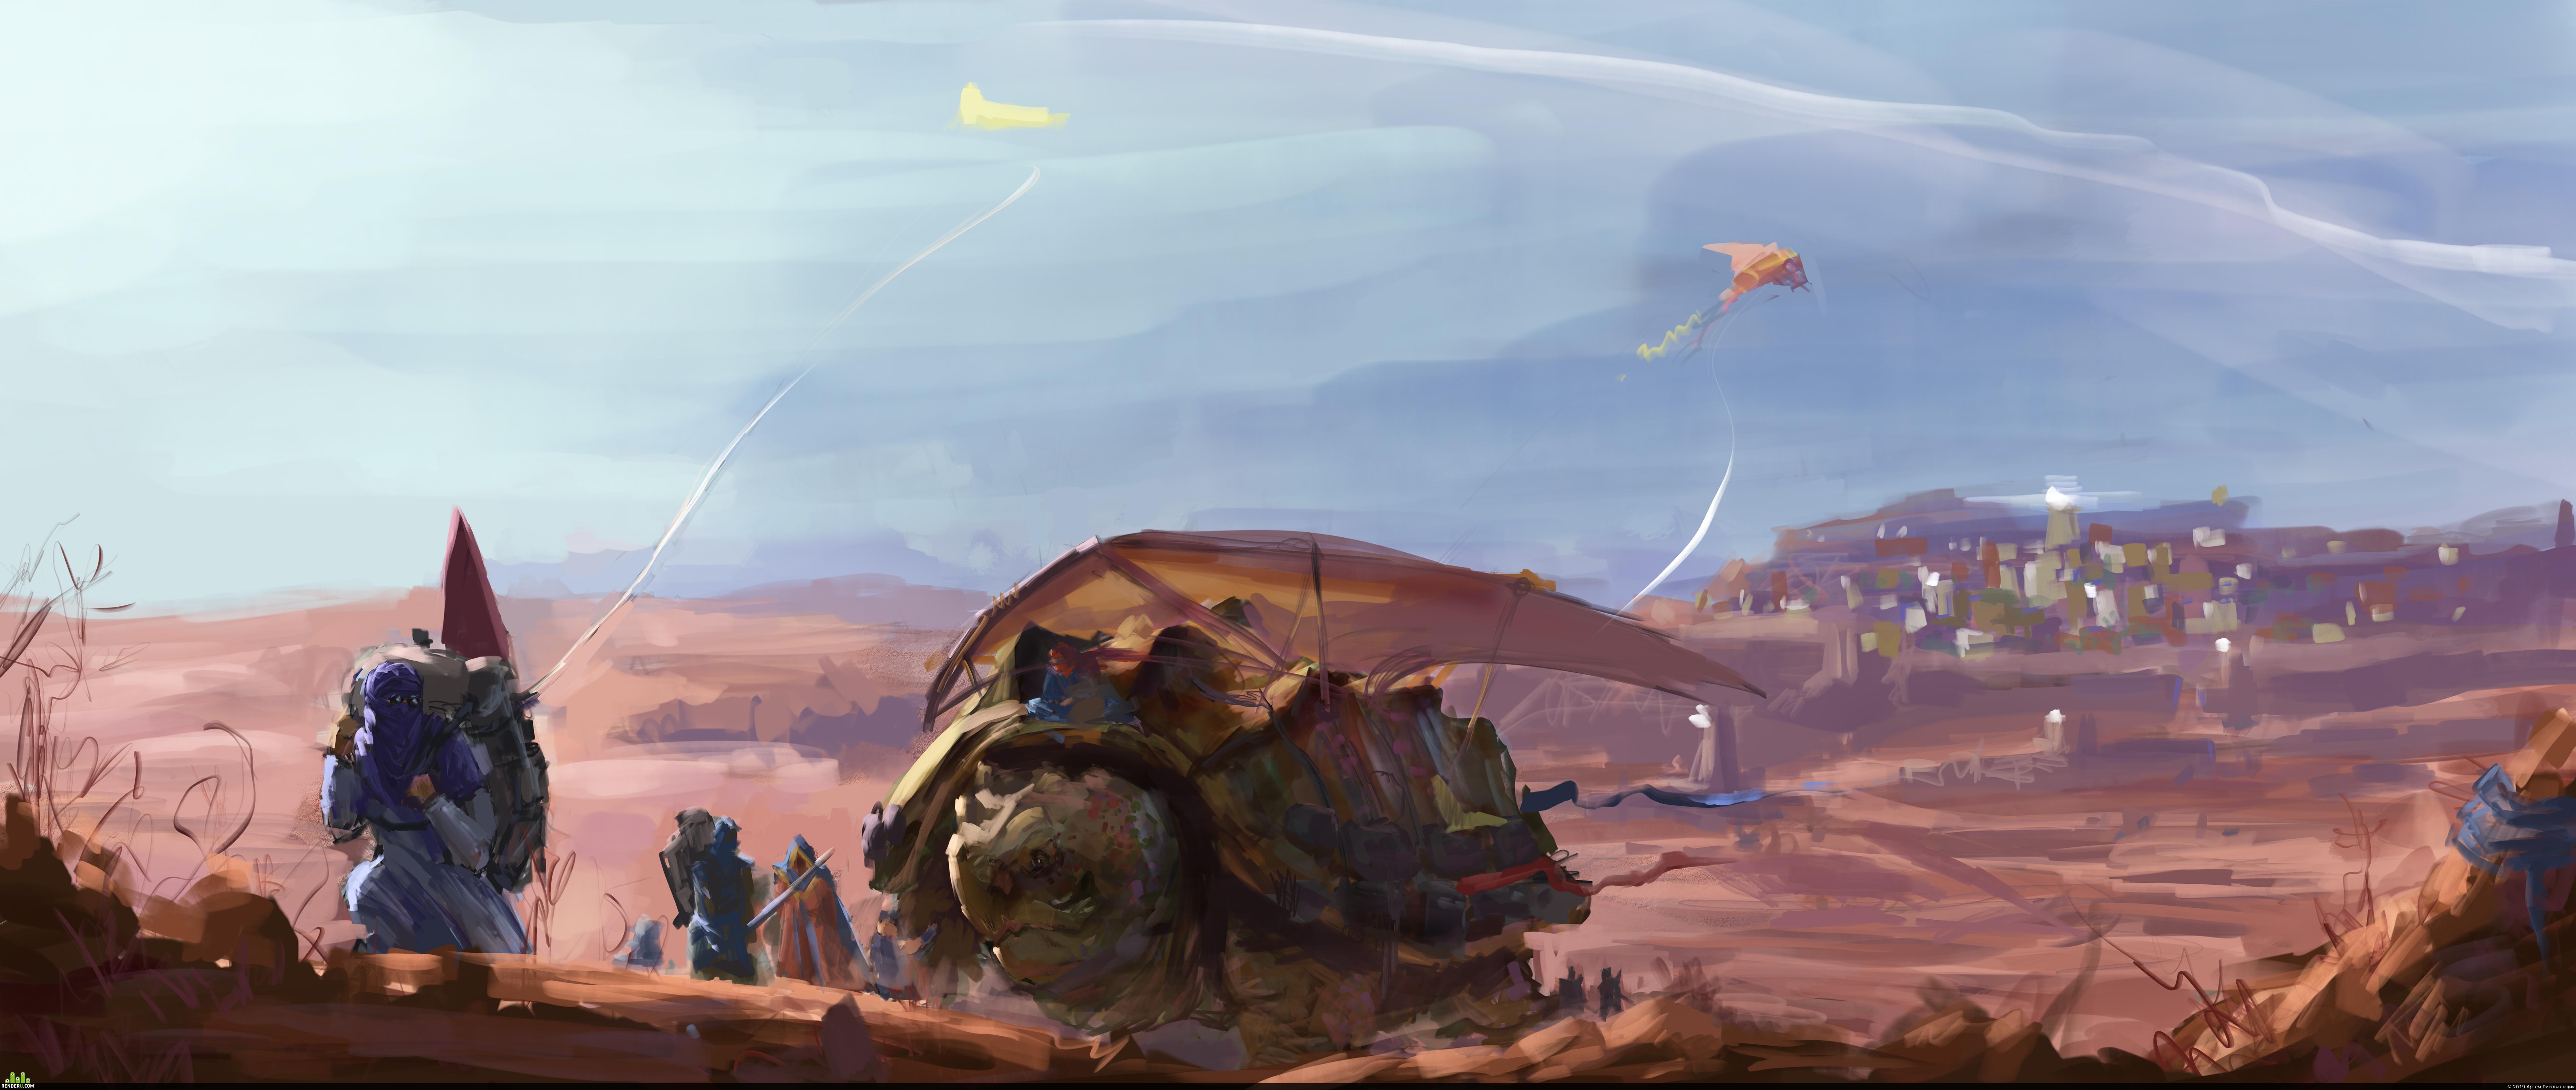 preview Караван из Красной пустыни